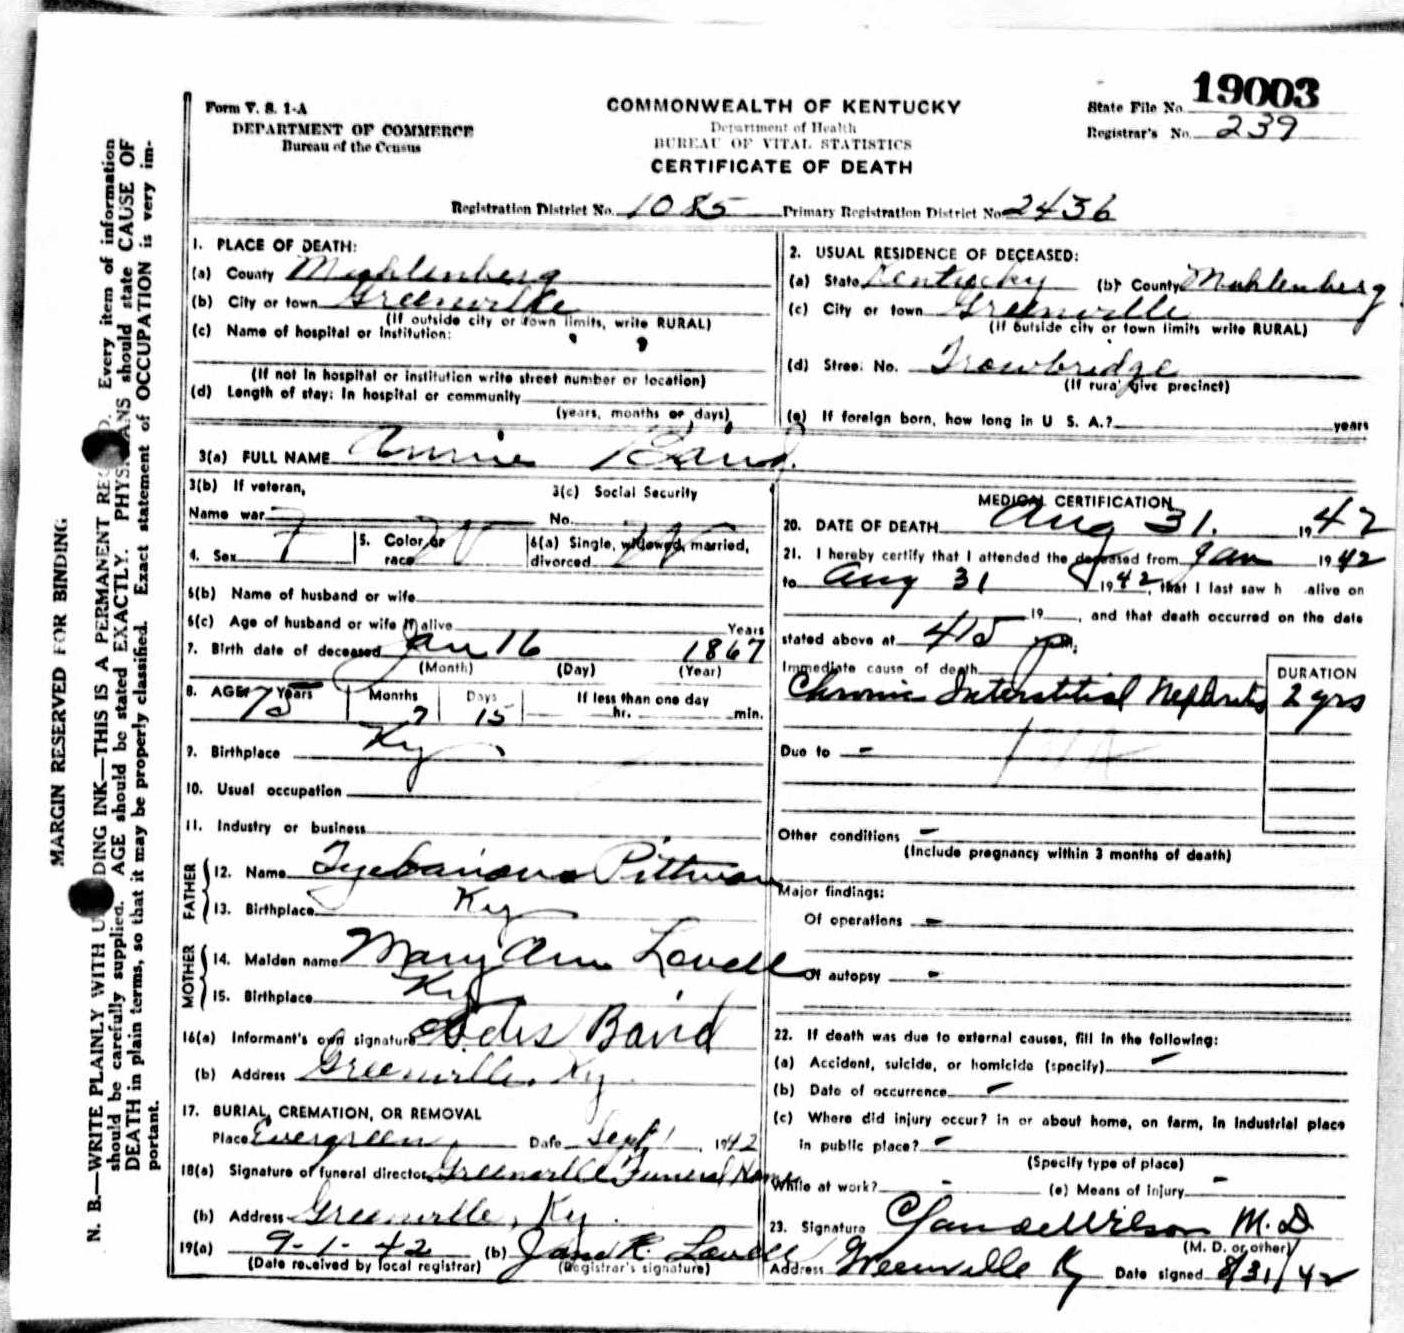 Death certificates ba kentucky death certificate 19003 xflitez Choice Image